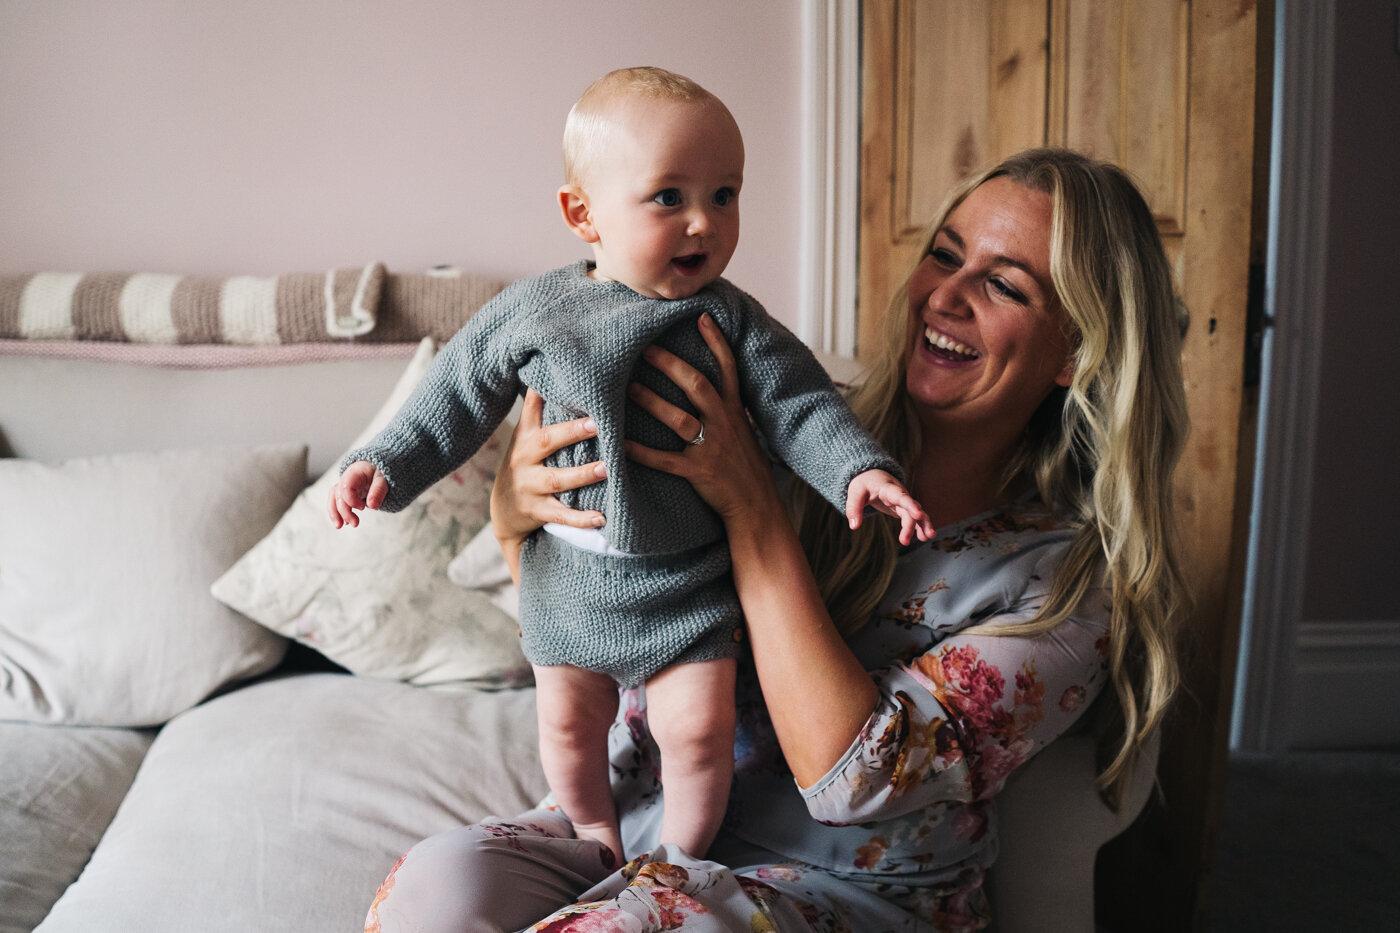 family-photography-teesside-north-yorkshire-newborn-baby-family-shoot-0007.jpg